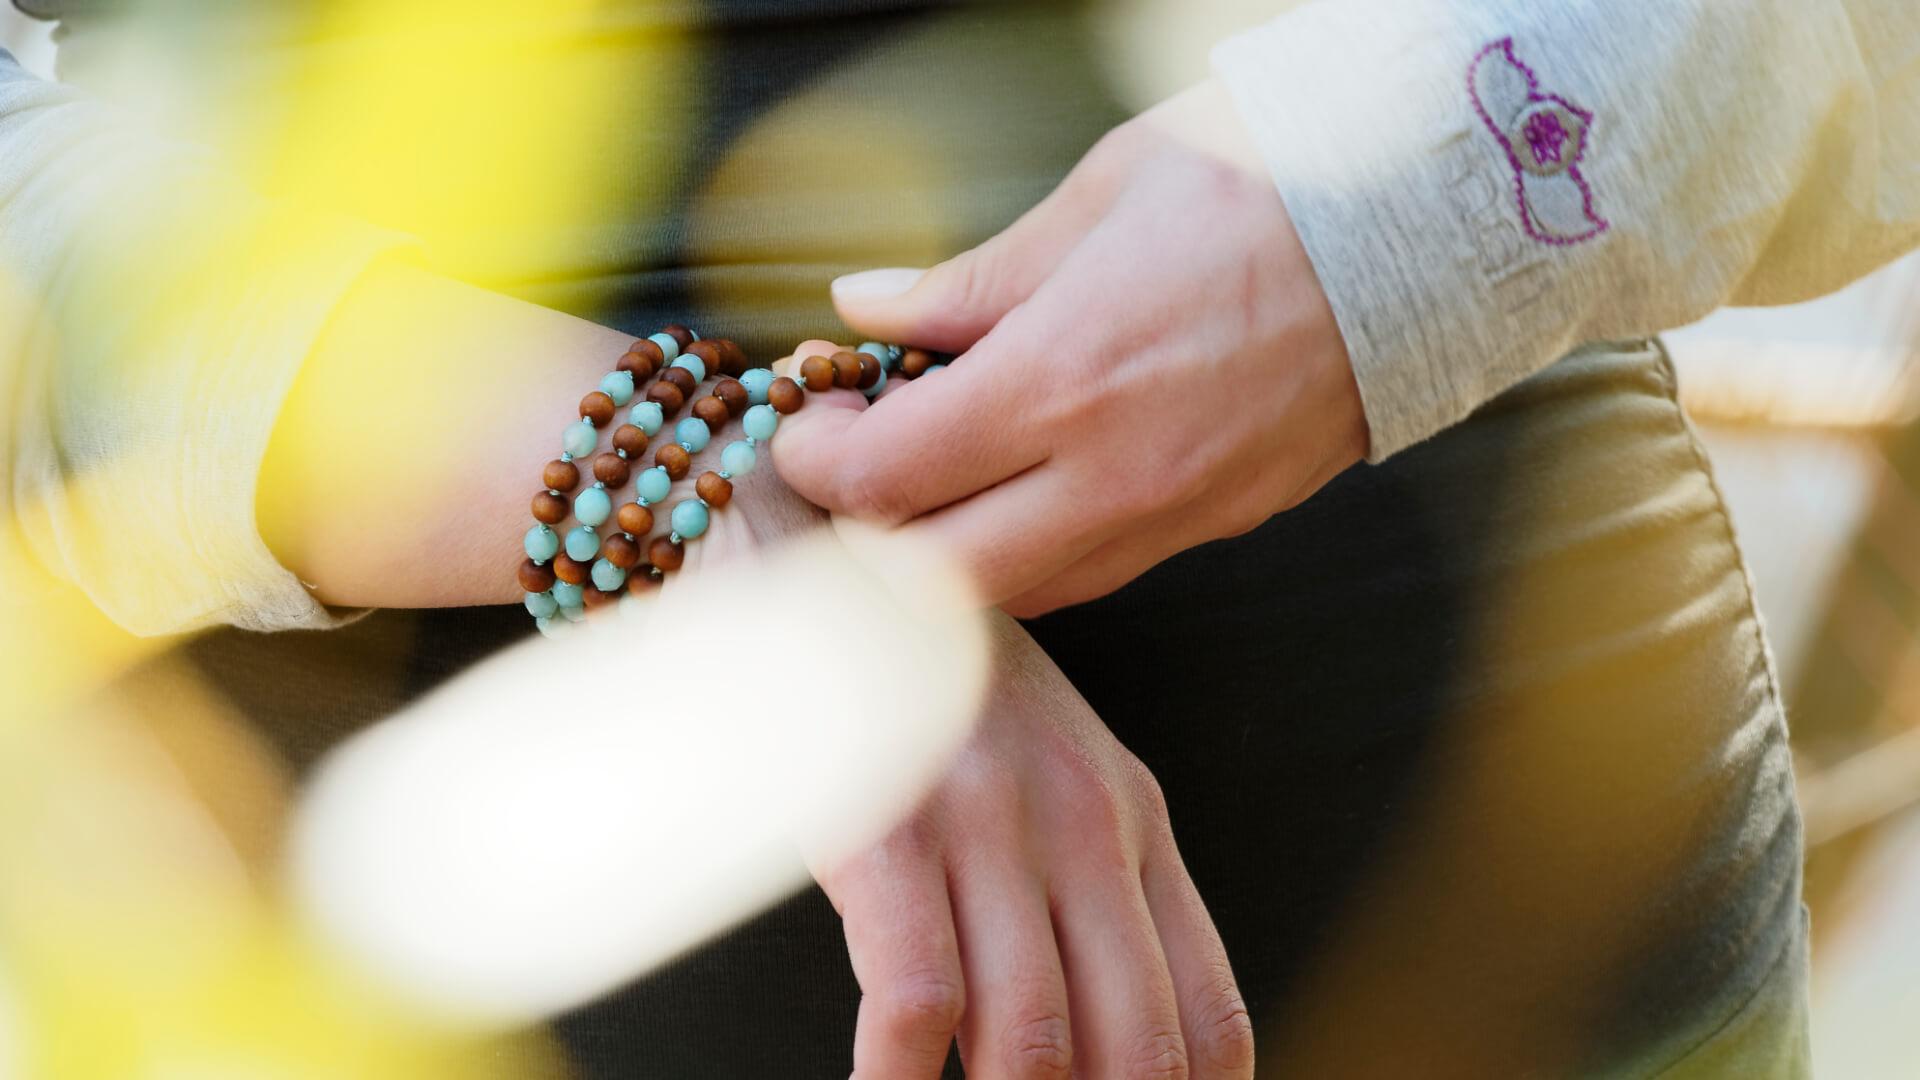 Mala kaufen | Shop Malawelt: Meditationsketten, Unikate